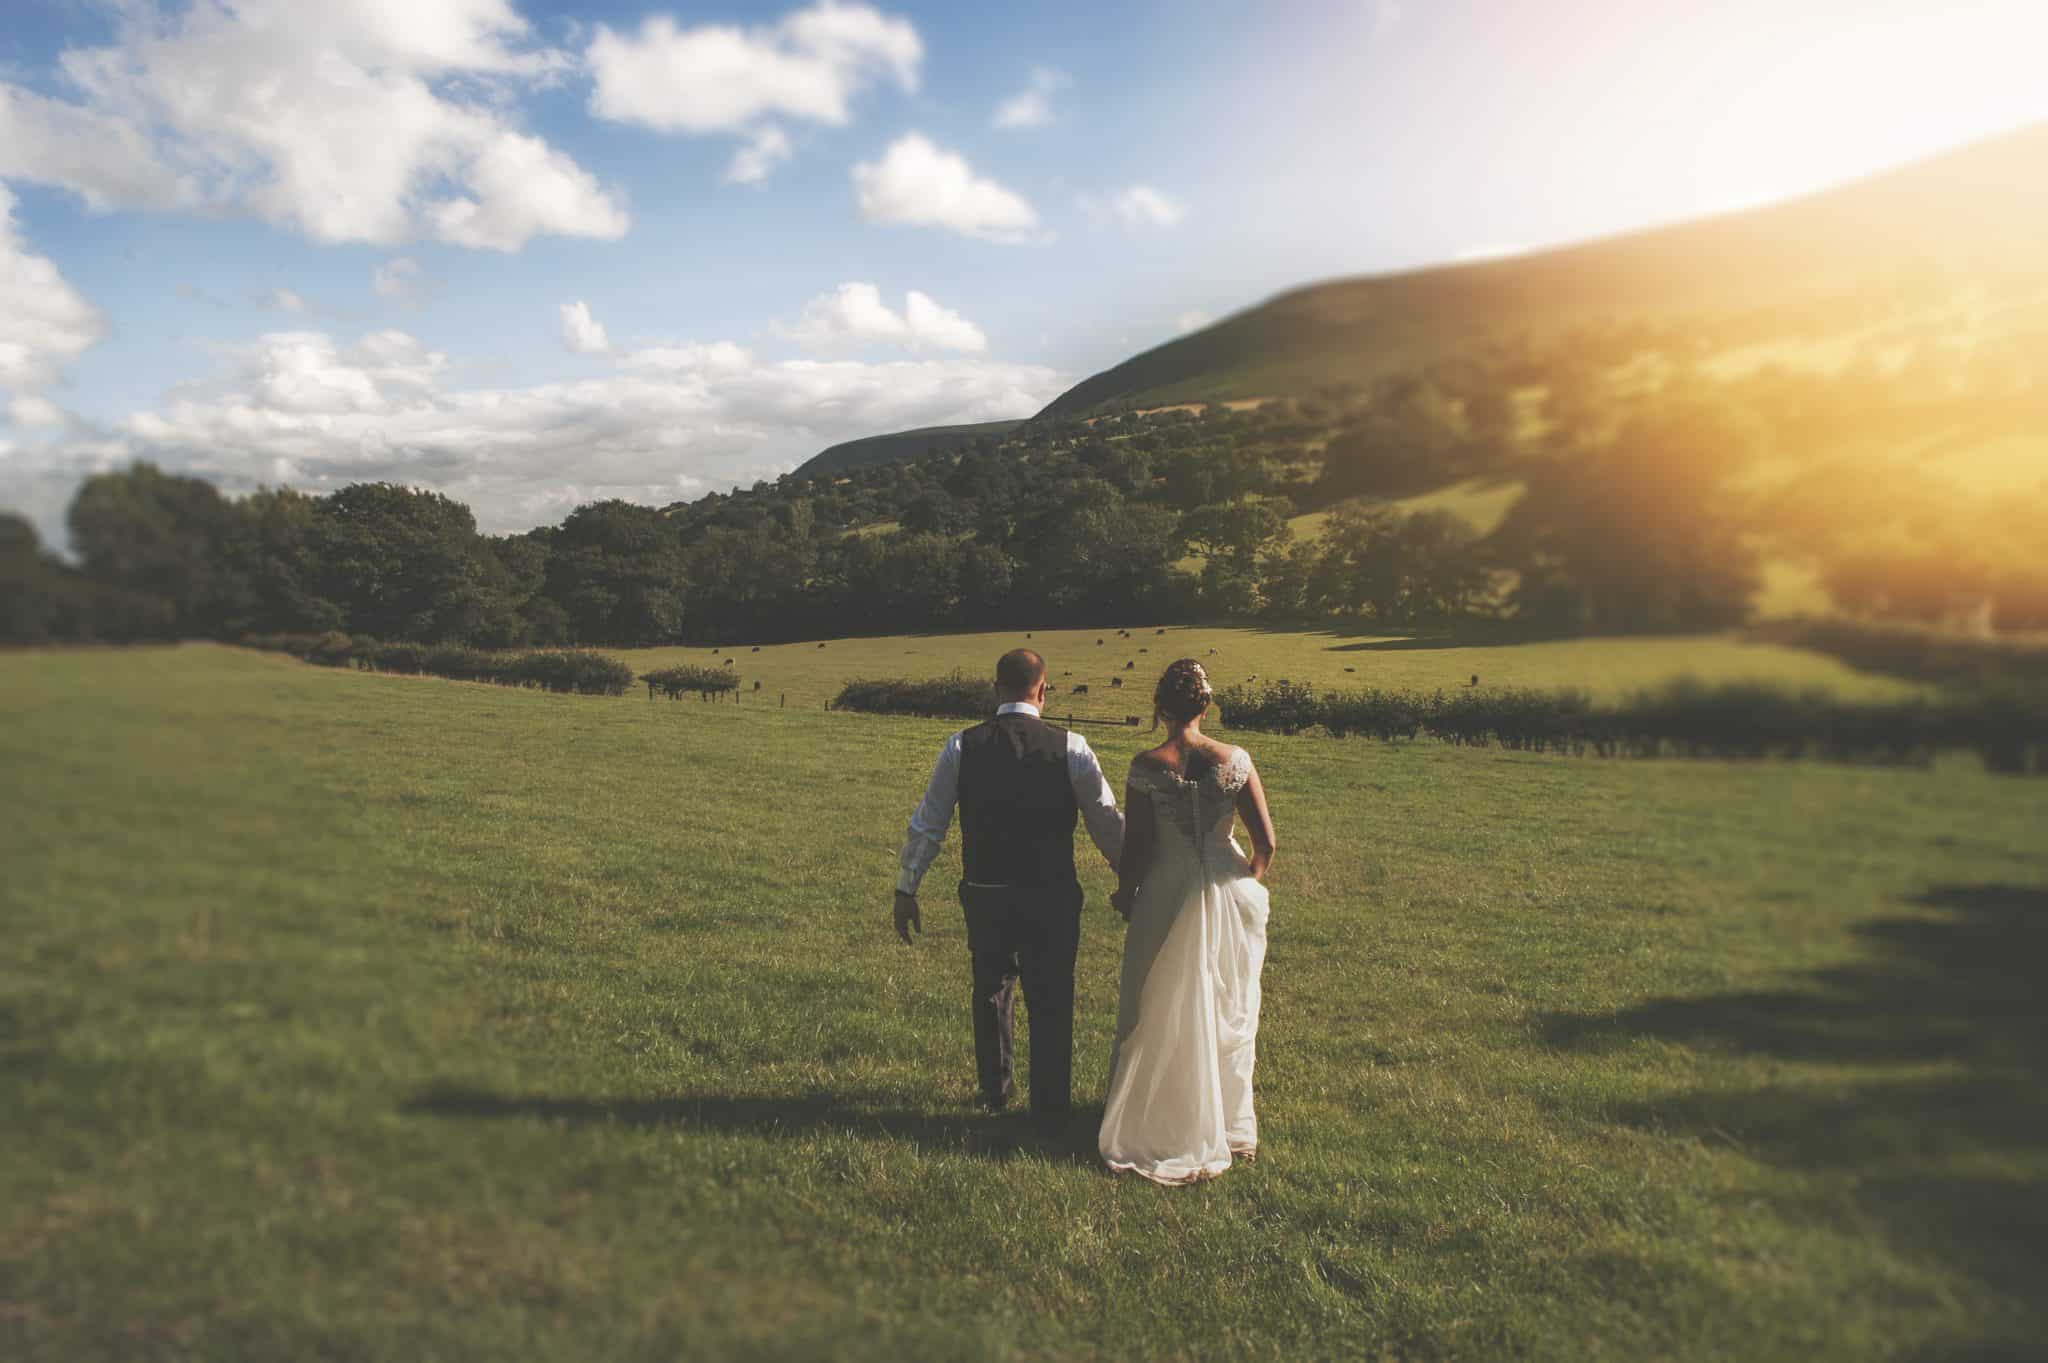 Bride & groom walk through field in sunshine wedding photographers cardiff